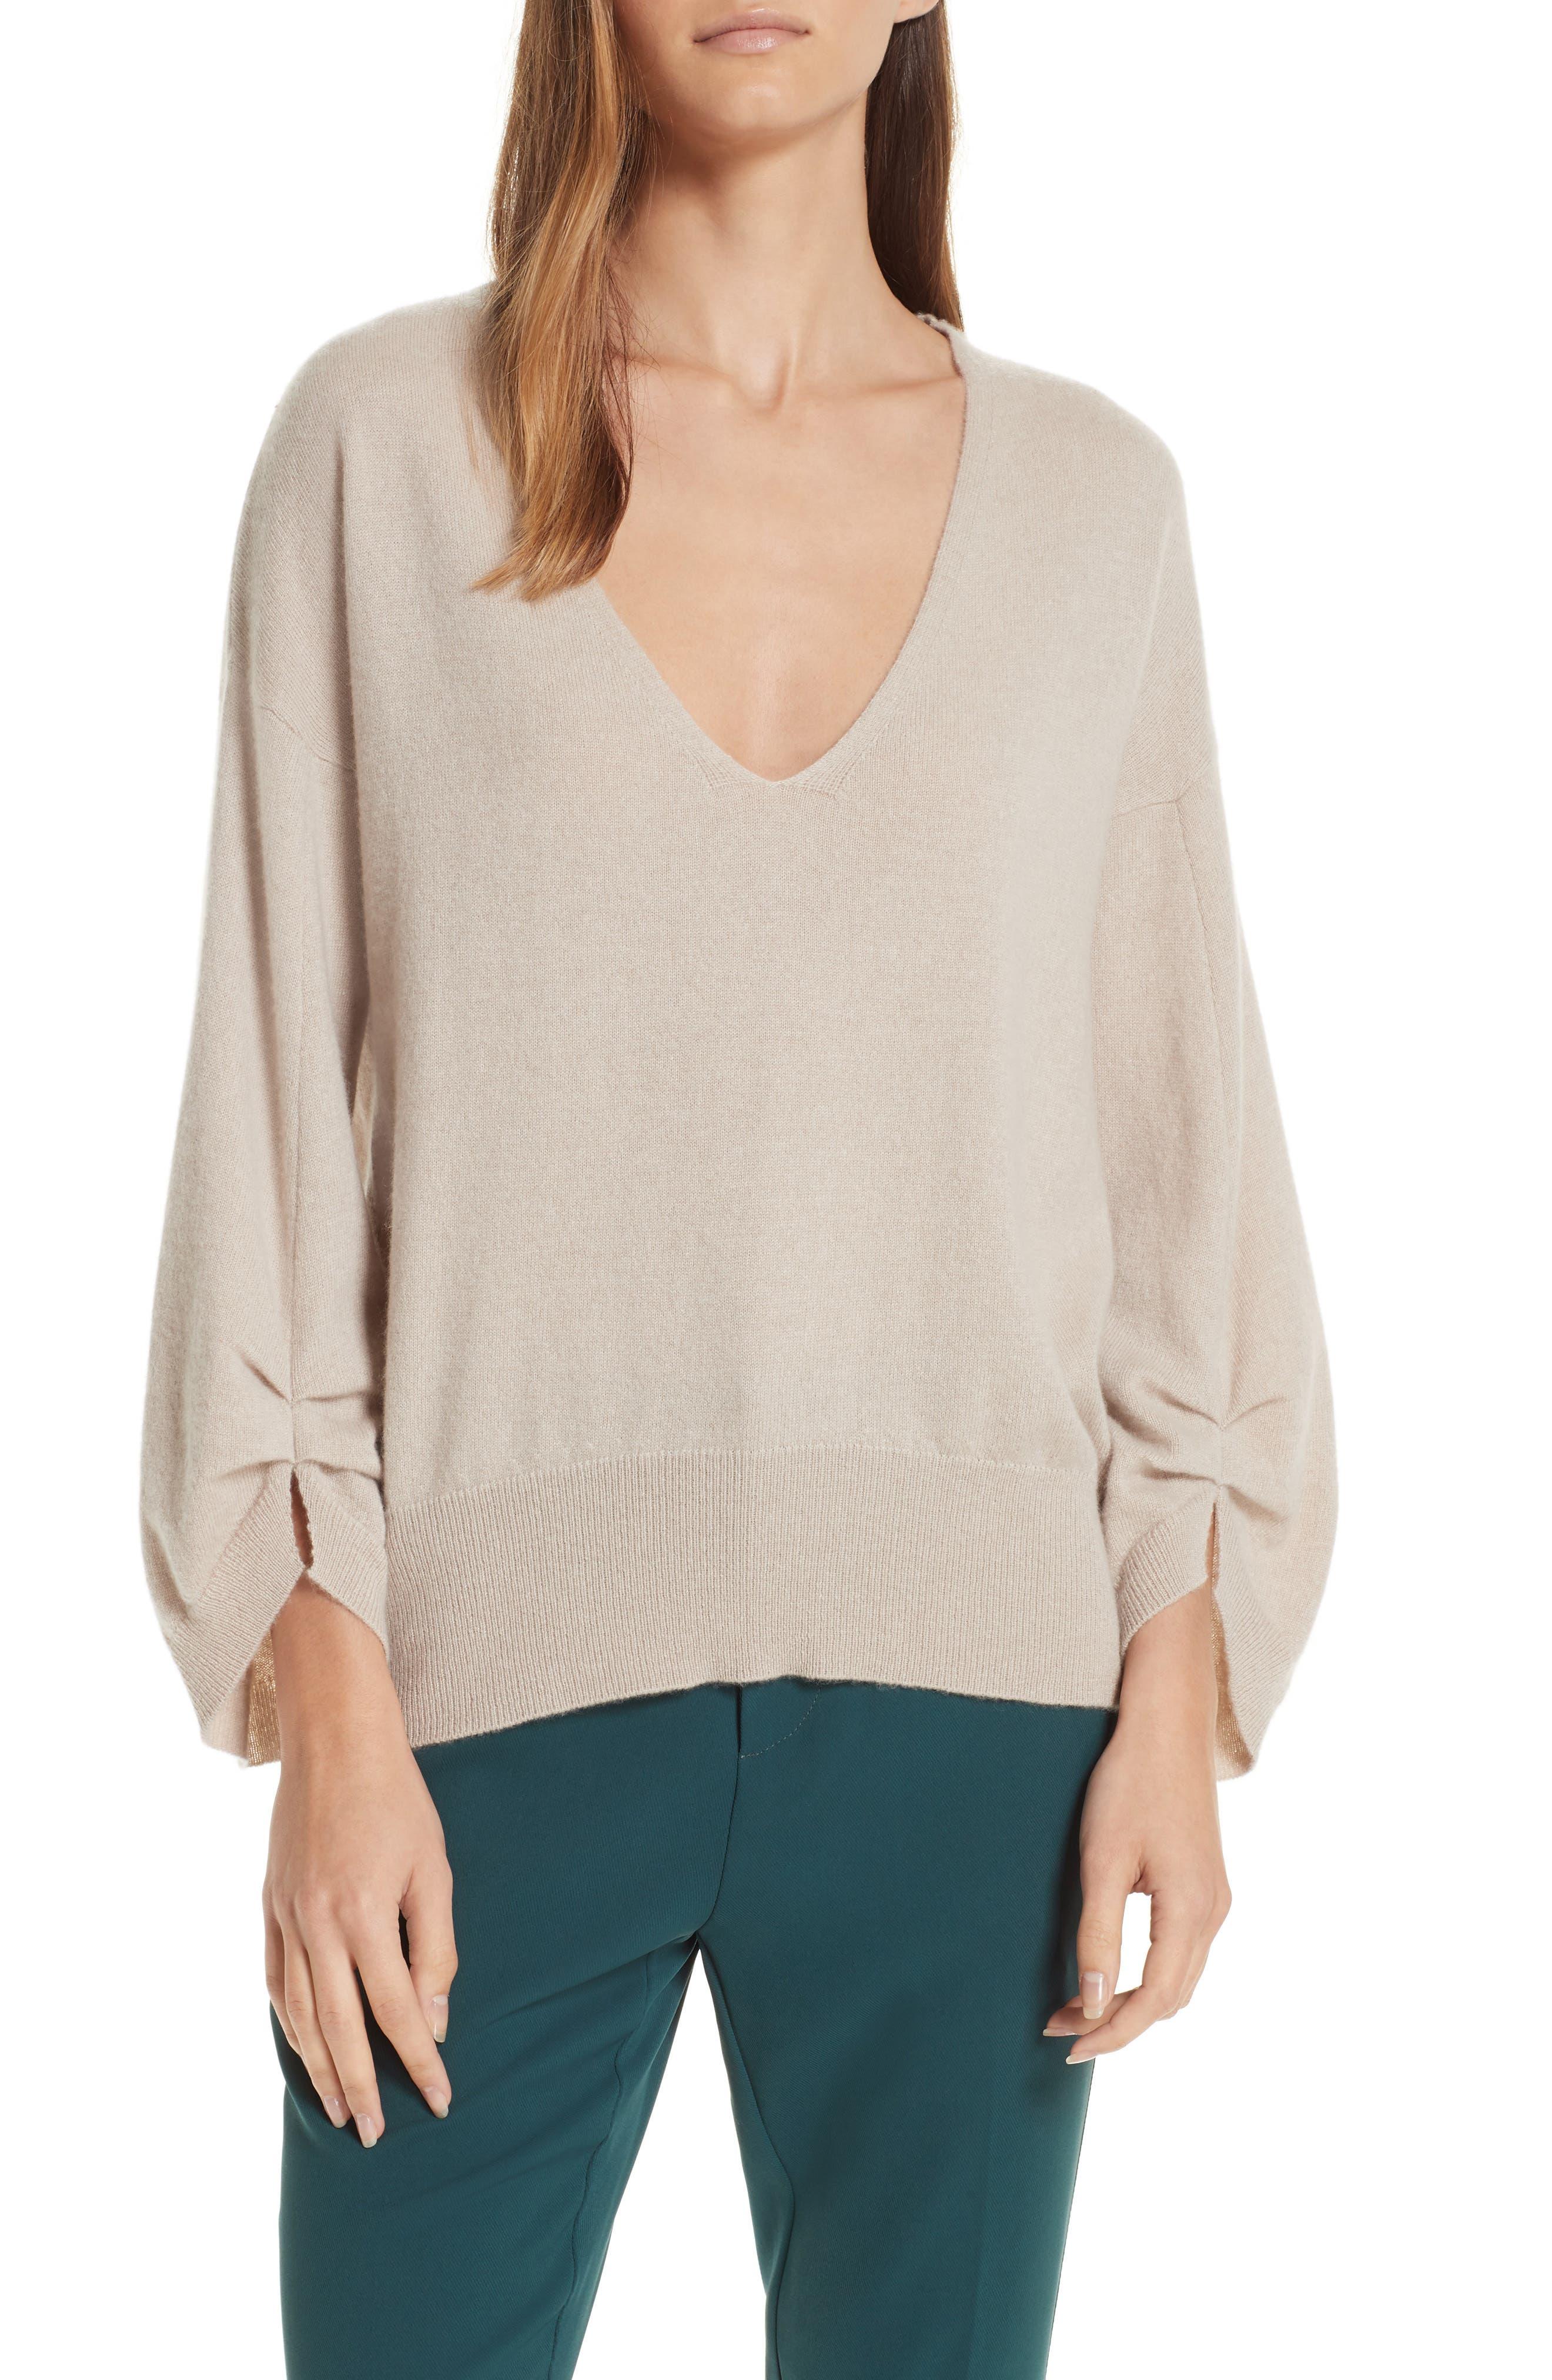 Brochu Walker Casimir Cashmere Pullover Sweater, Beige